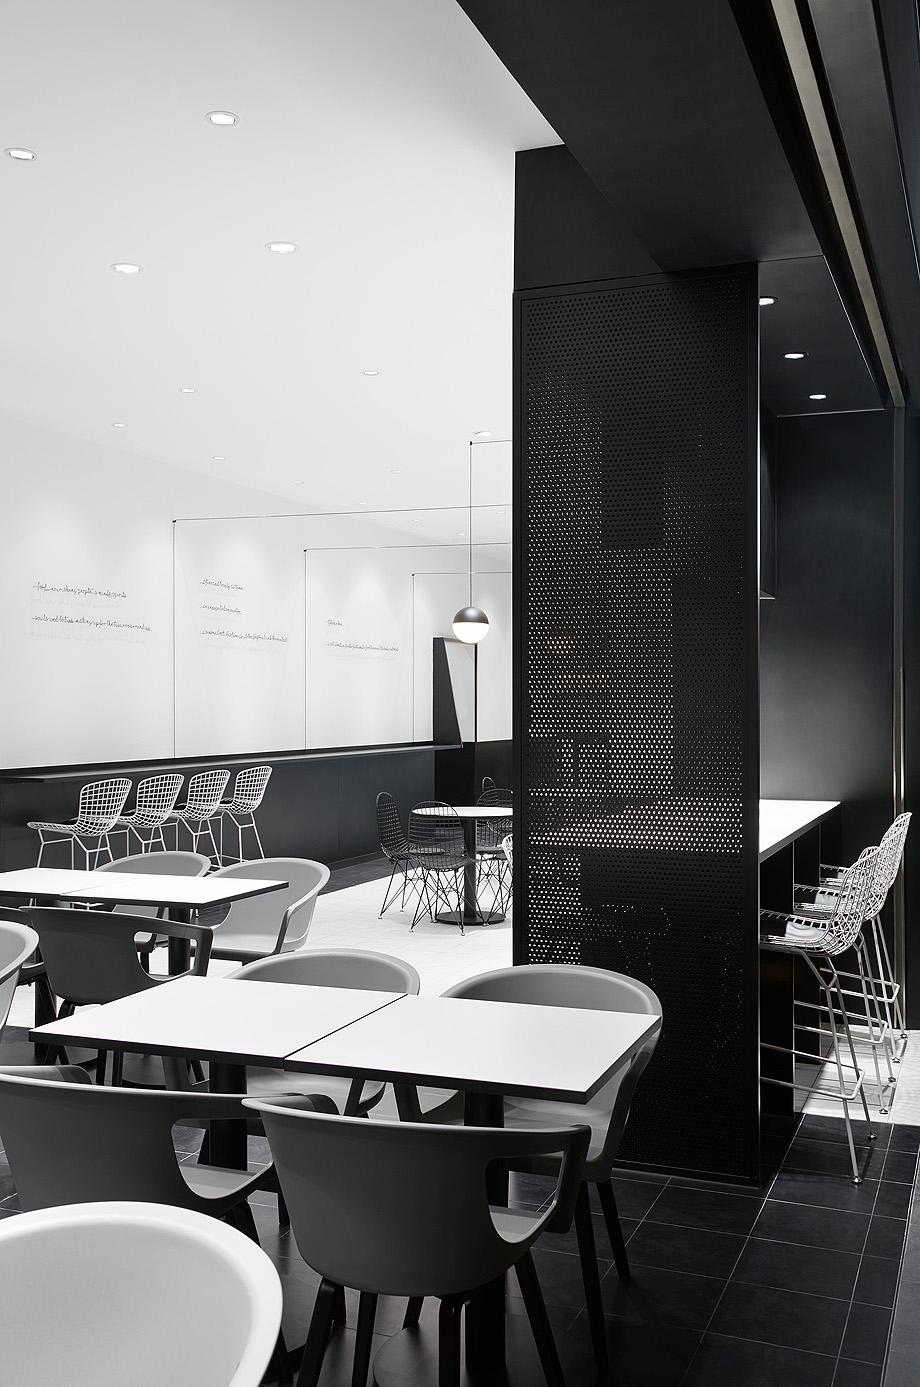 restaurante tdf de leaping creative (10)